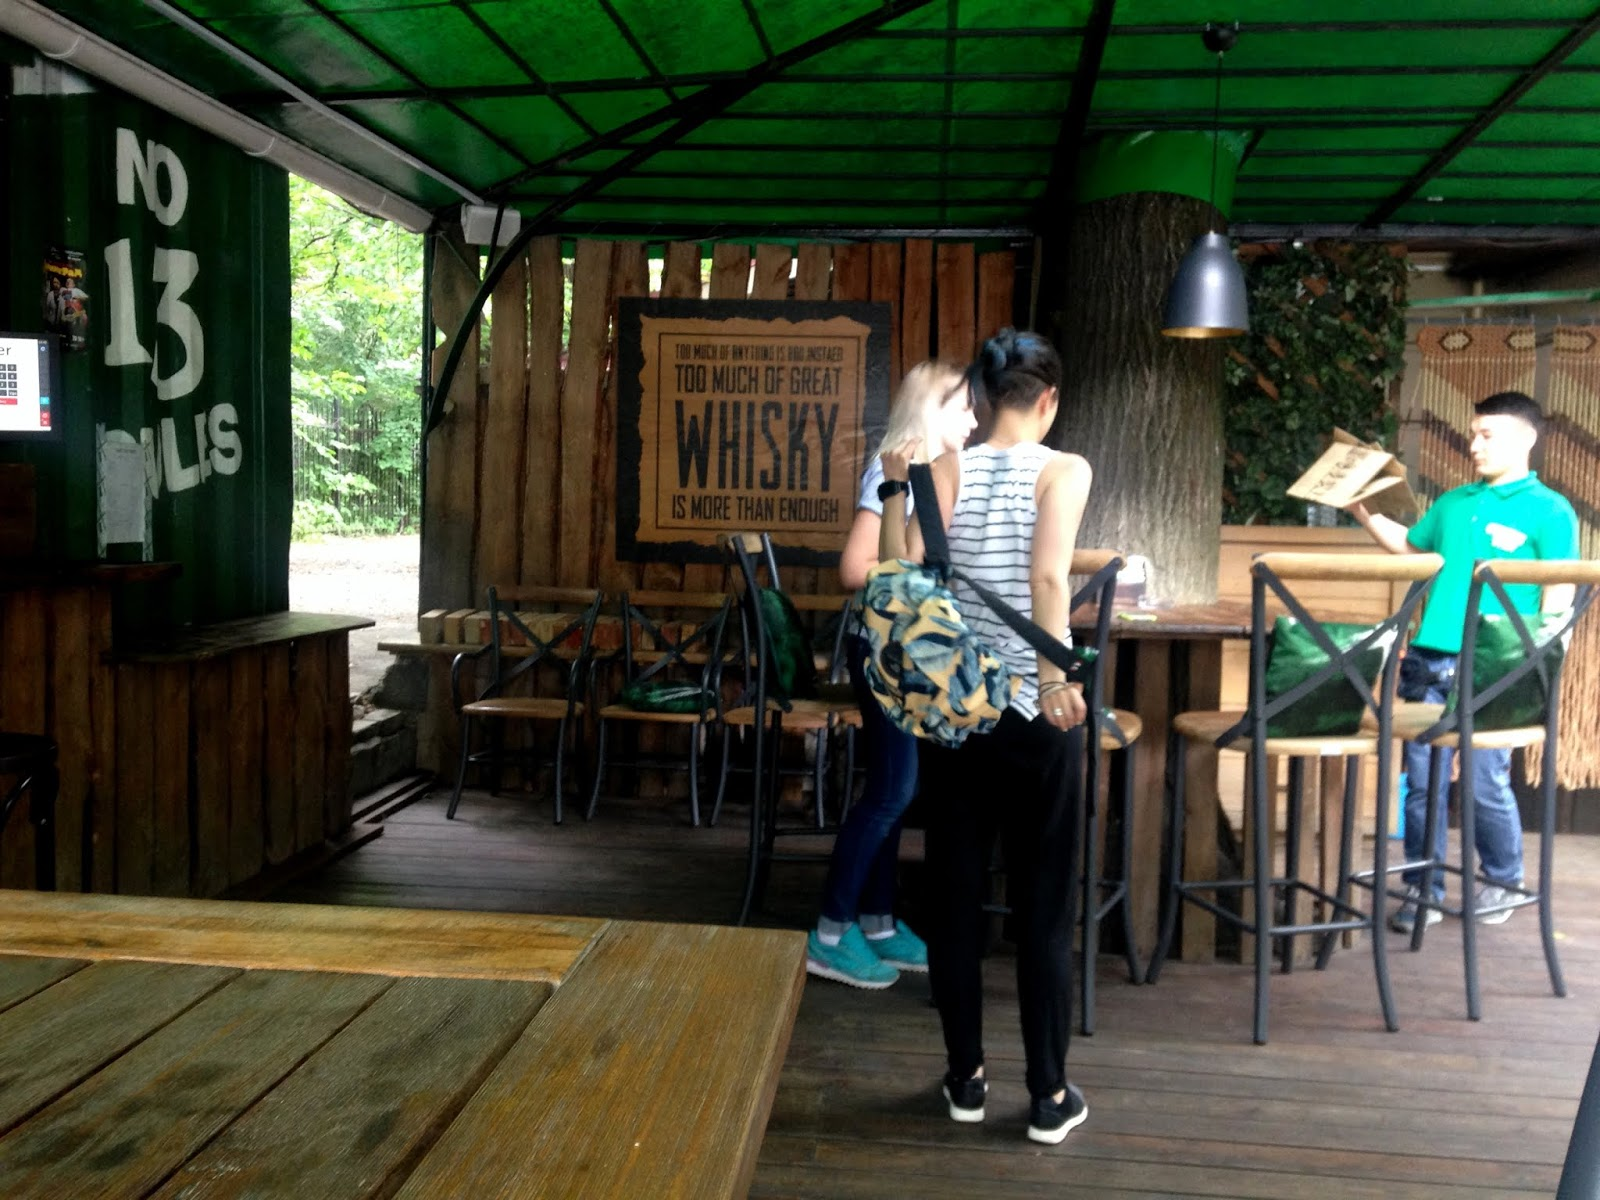 Ałmaty bar